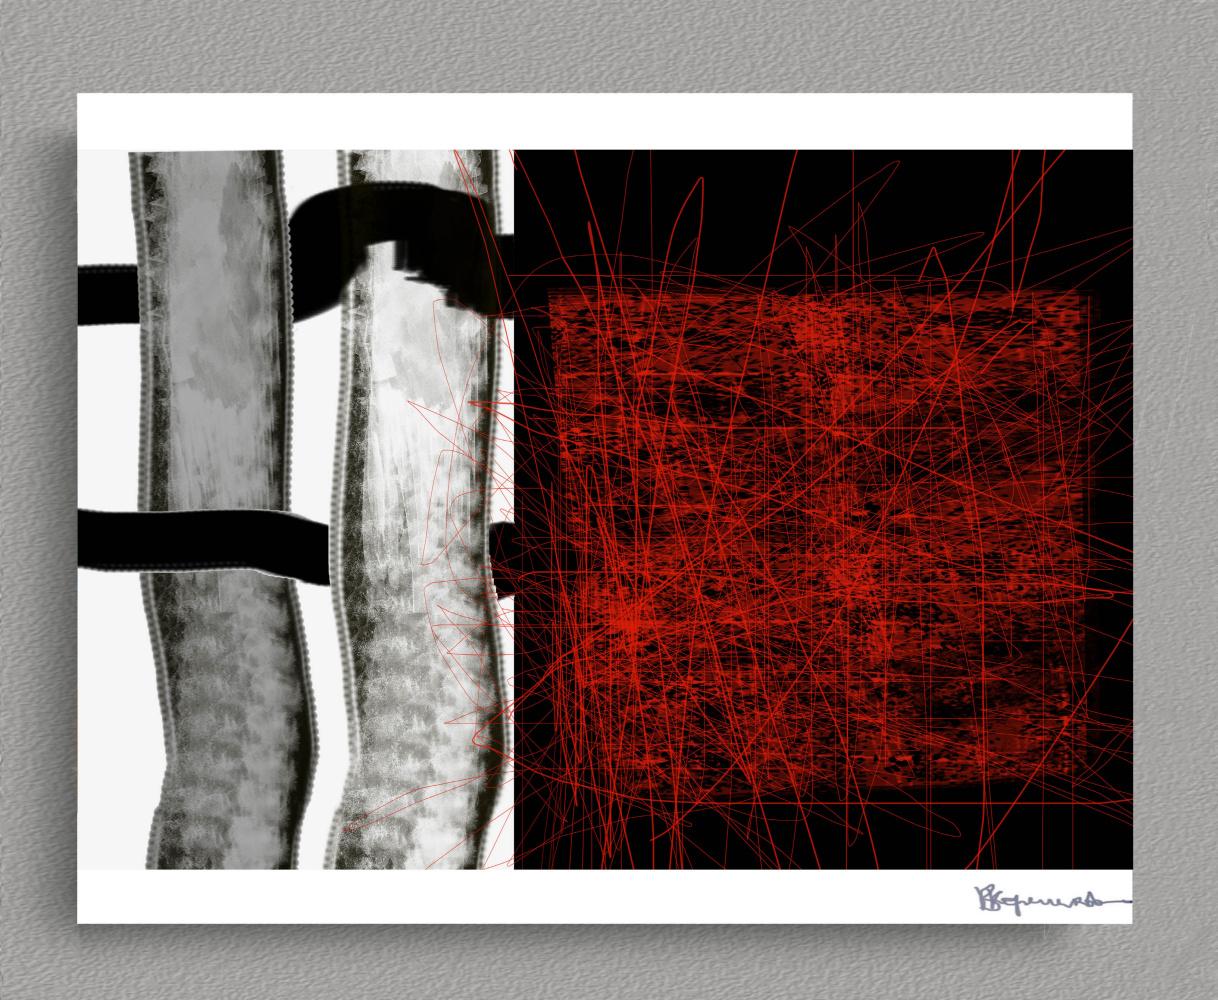 Vladimir Evgen'evich Koreshkov. Beautiful red